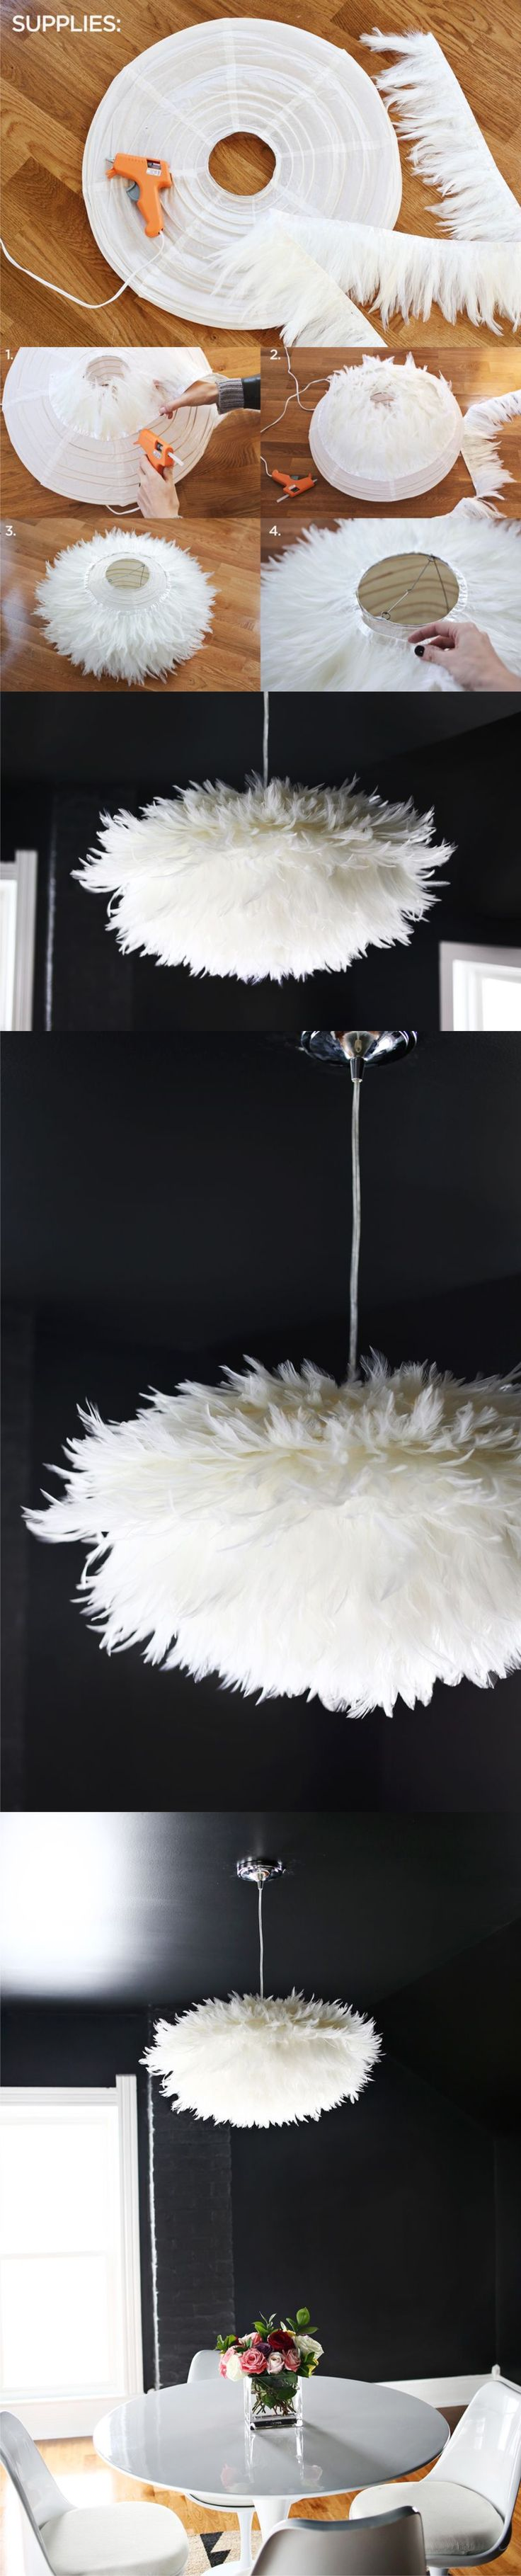 DIY Chic White Feather Chandelier.